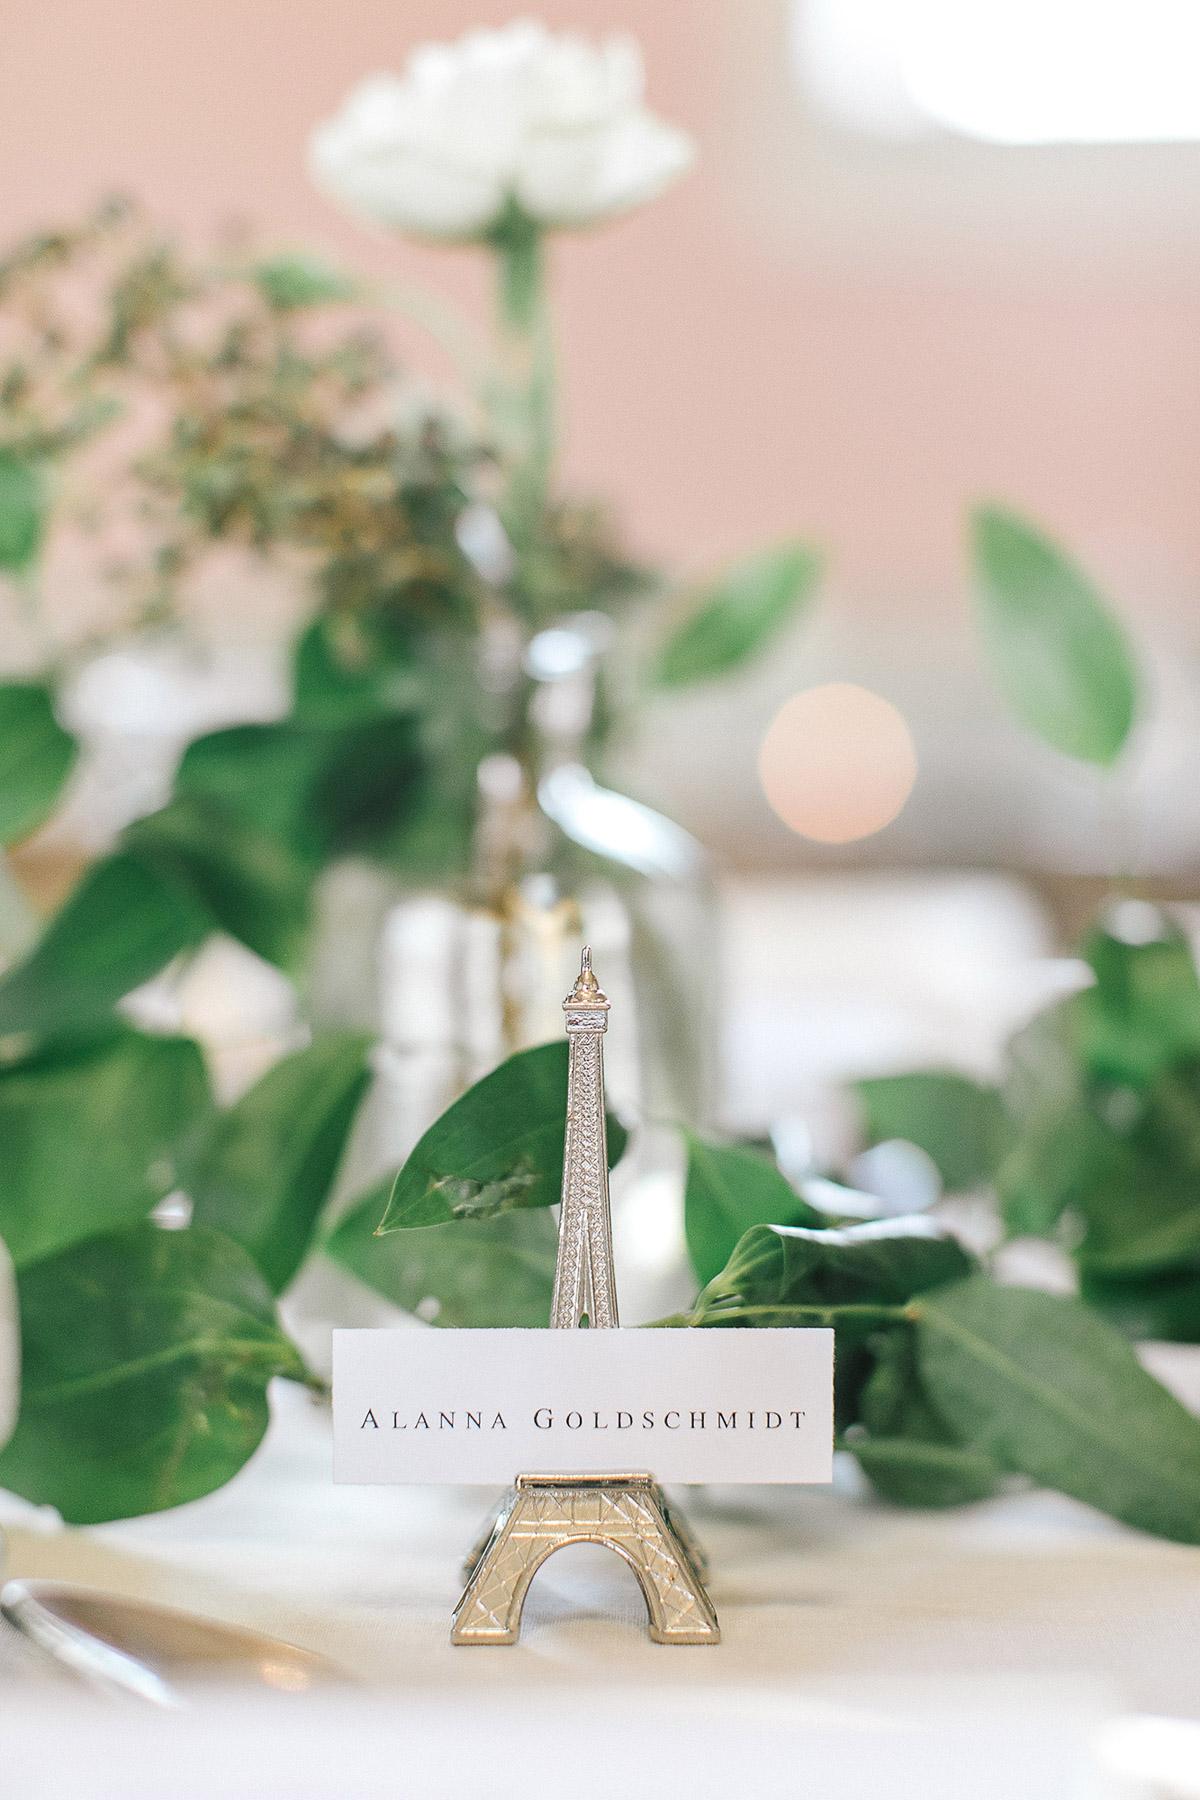 tamara-lockwood-photography-vineyard-bride-swish-list-the-old-courthouse-niagara-on-the-lake-wedding-62.jpg